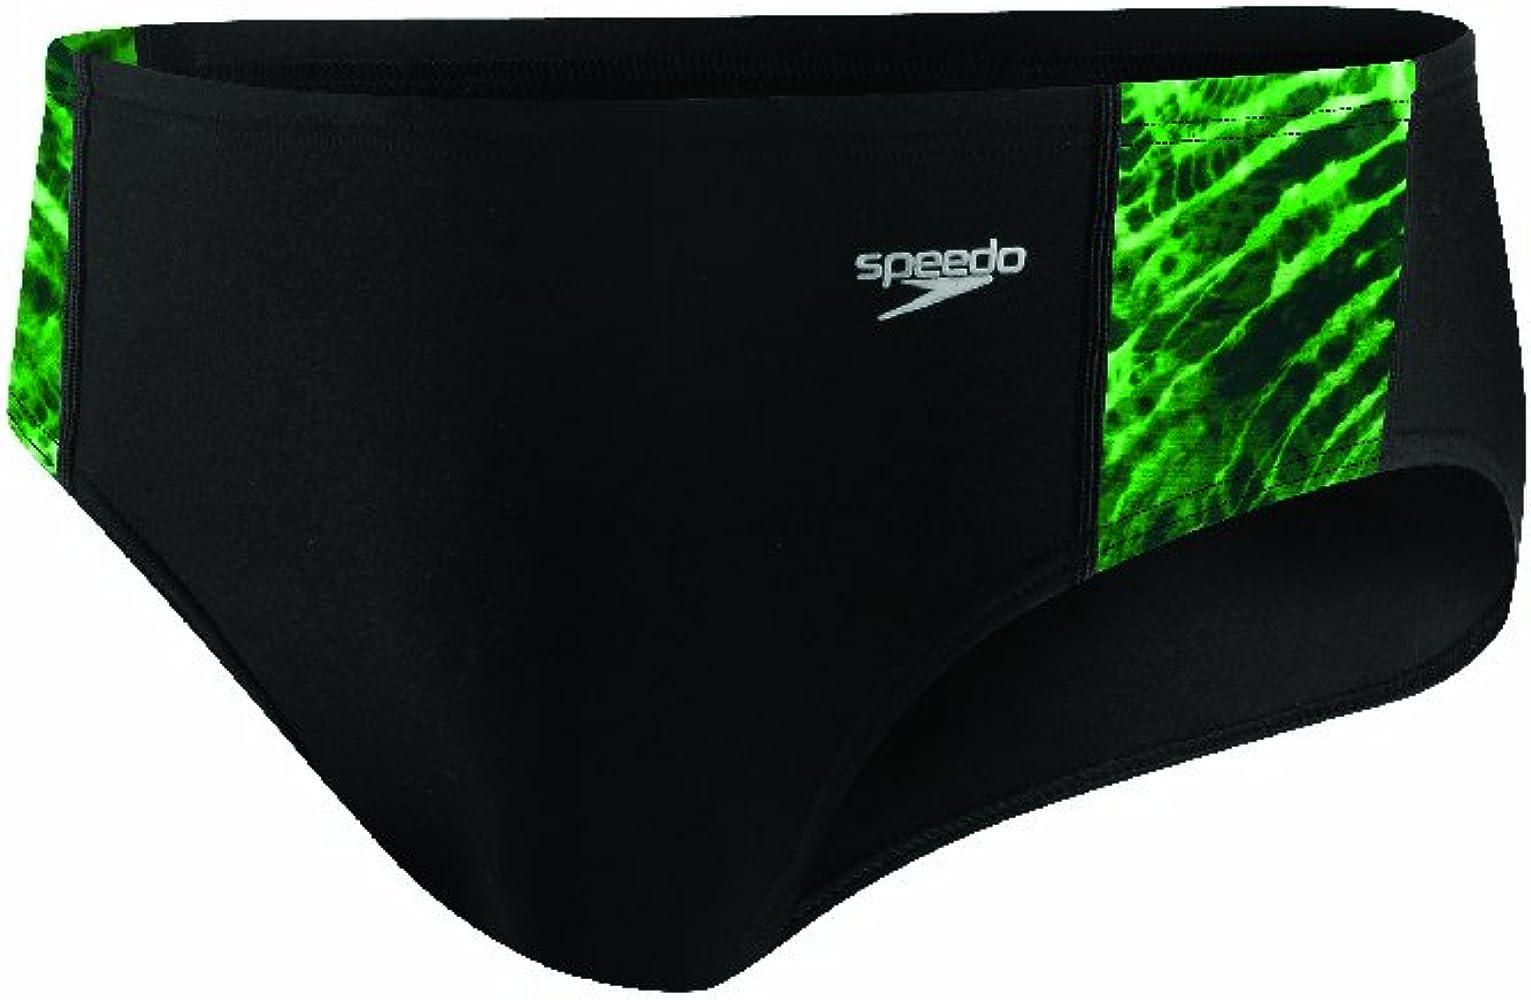 Toxic Tie Dye Brief Swimsuit Speedo Mens Endurance